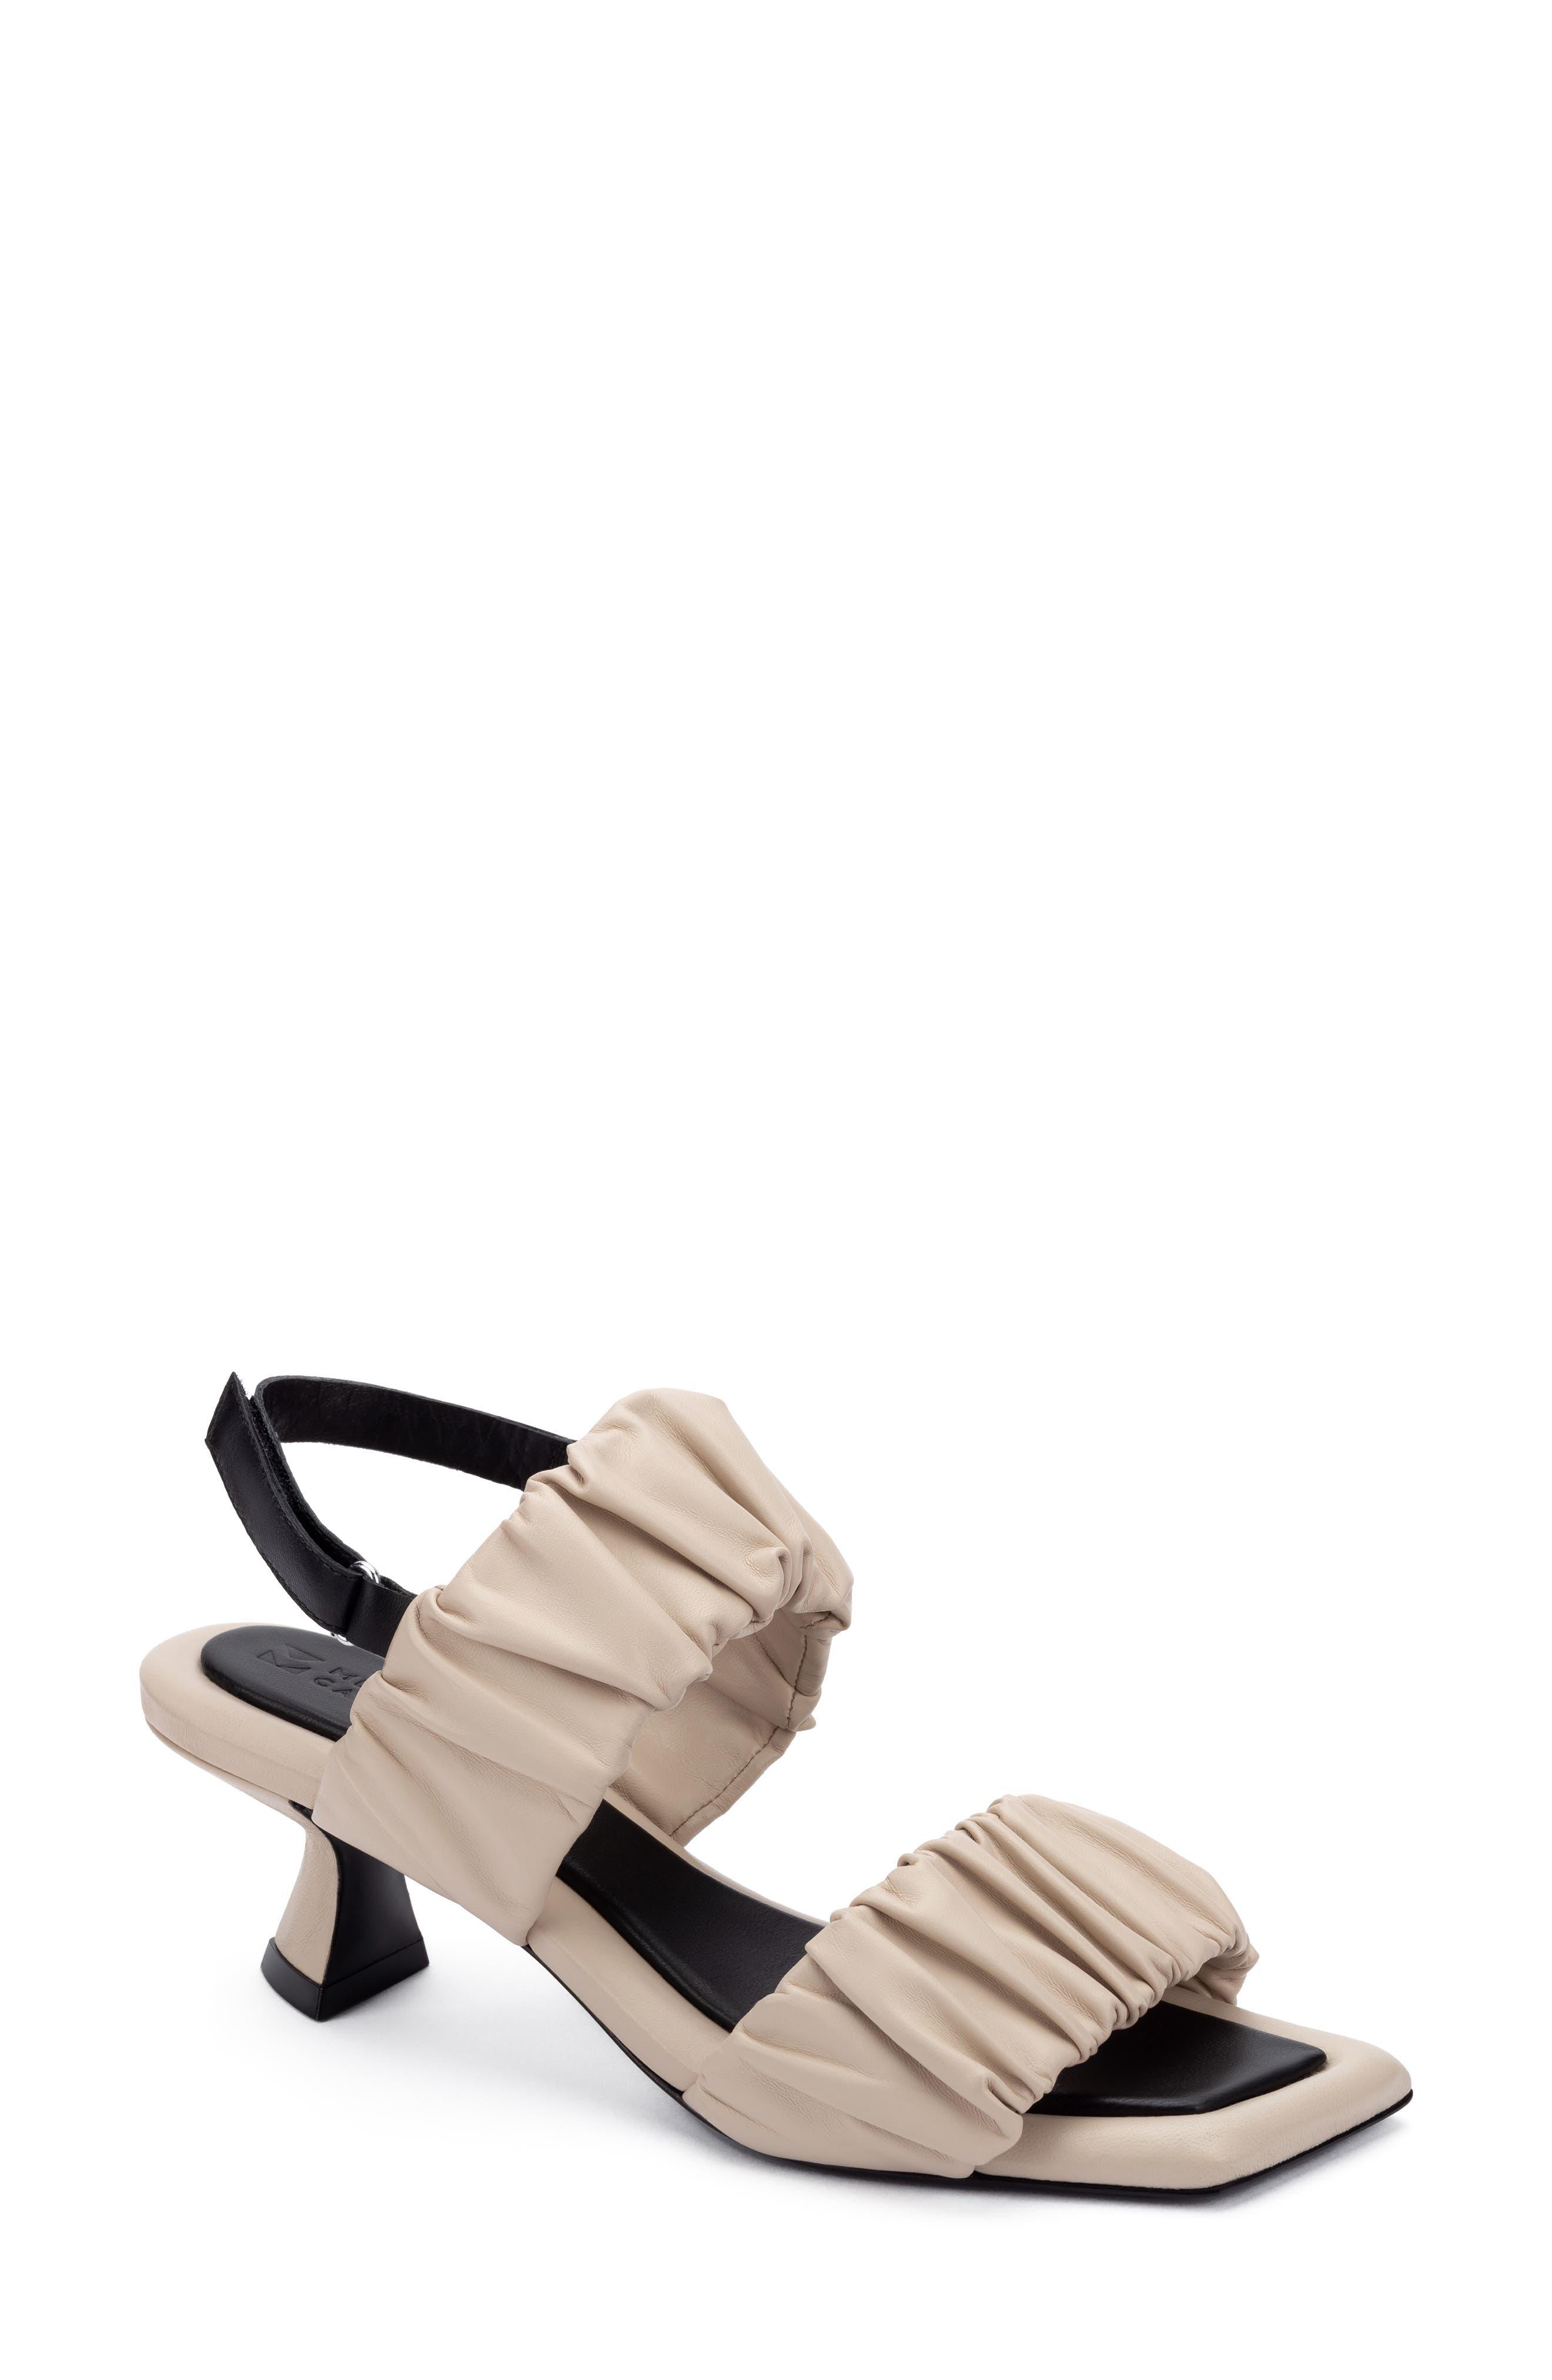 Brea Sandal